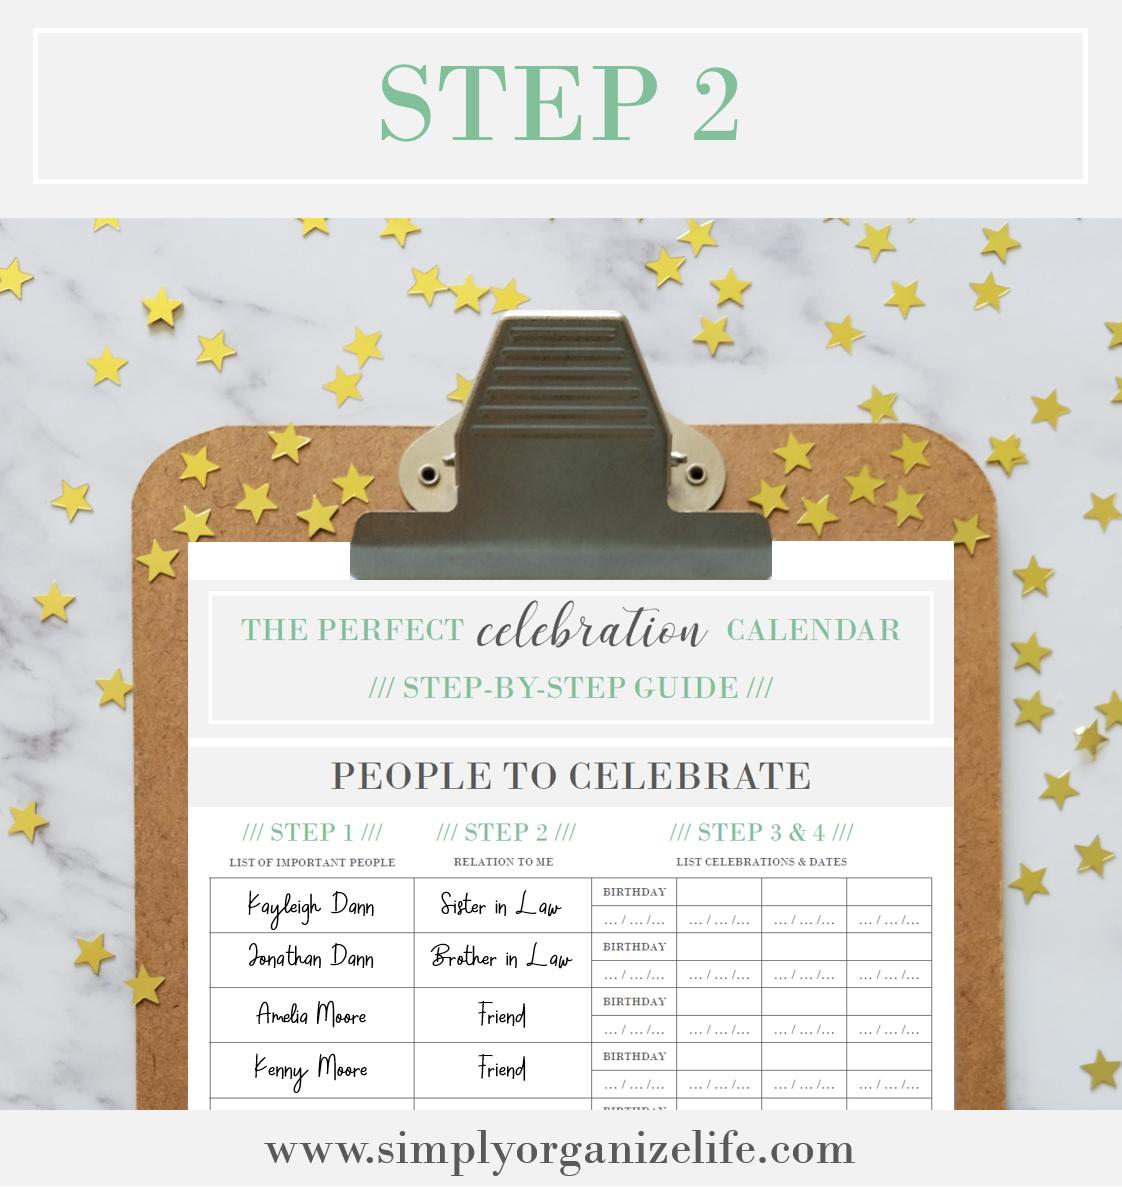 SIMPLY-ORGANIZE-LIFE-PERFECT-CELEBRATION-BIRTHDAY-CALENDAR-FREE-PRINTABLE-STEP-2